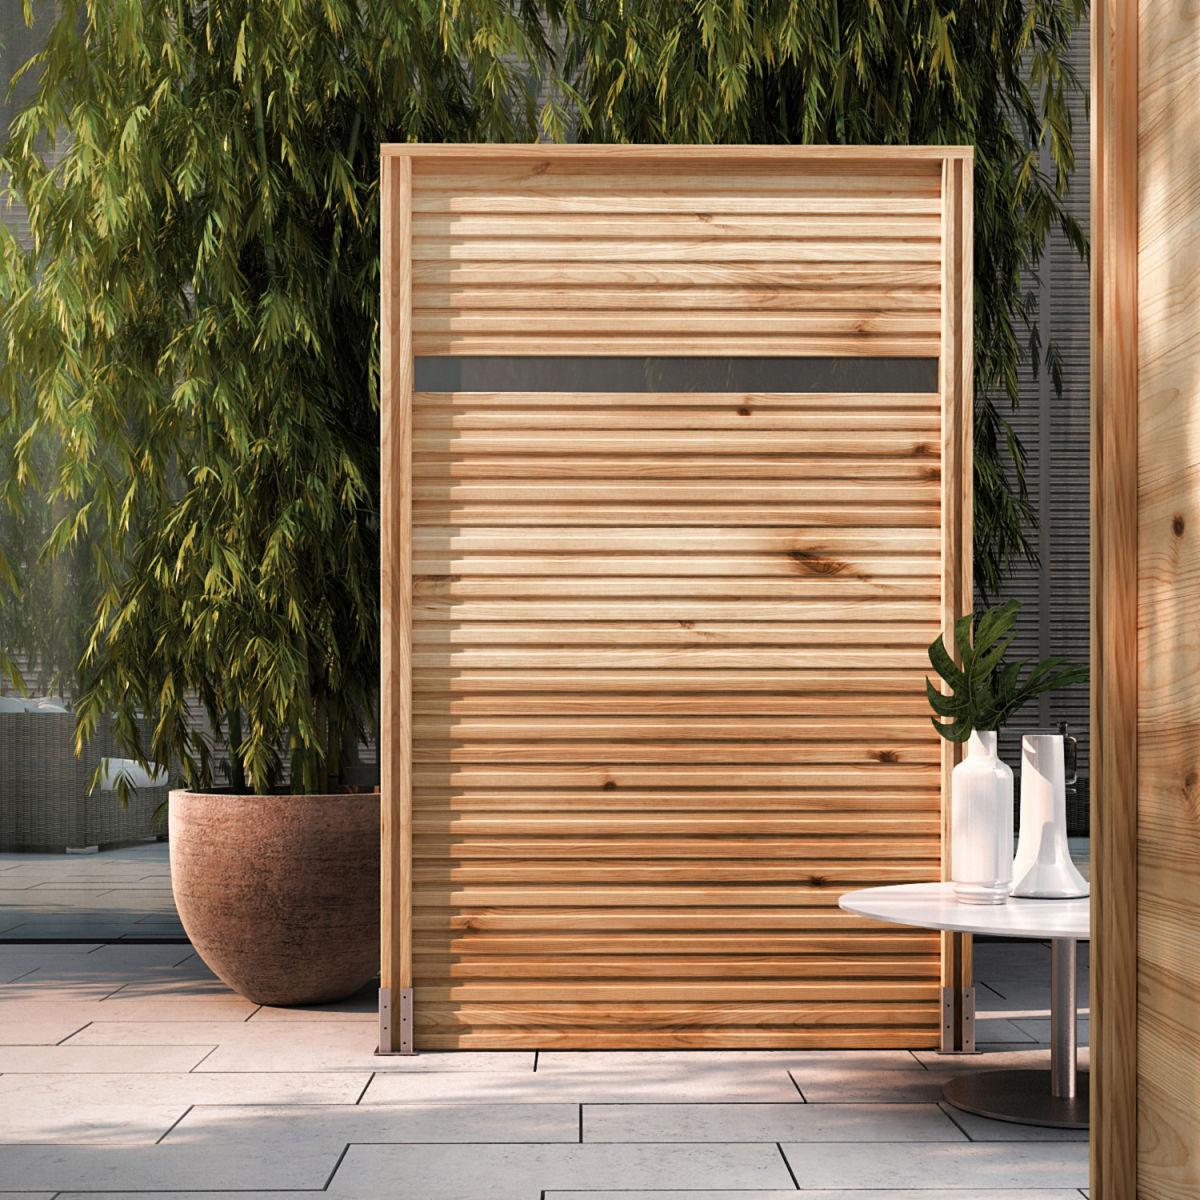 Emejing paravento da esterno gallery for Divisori da giardino